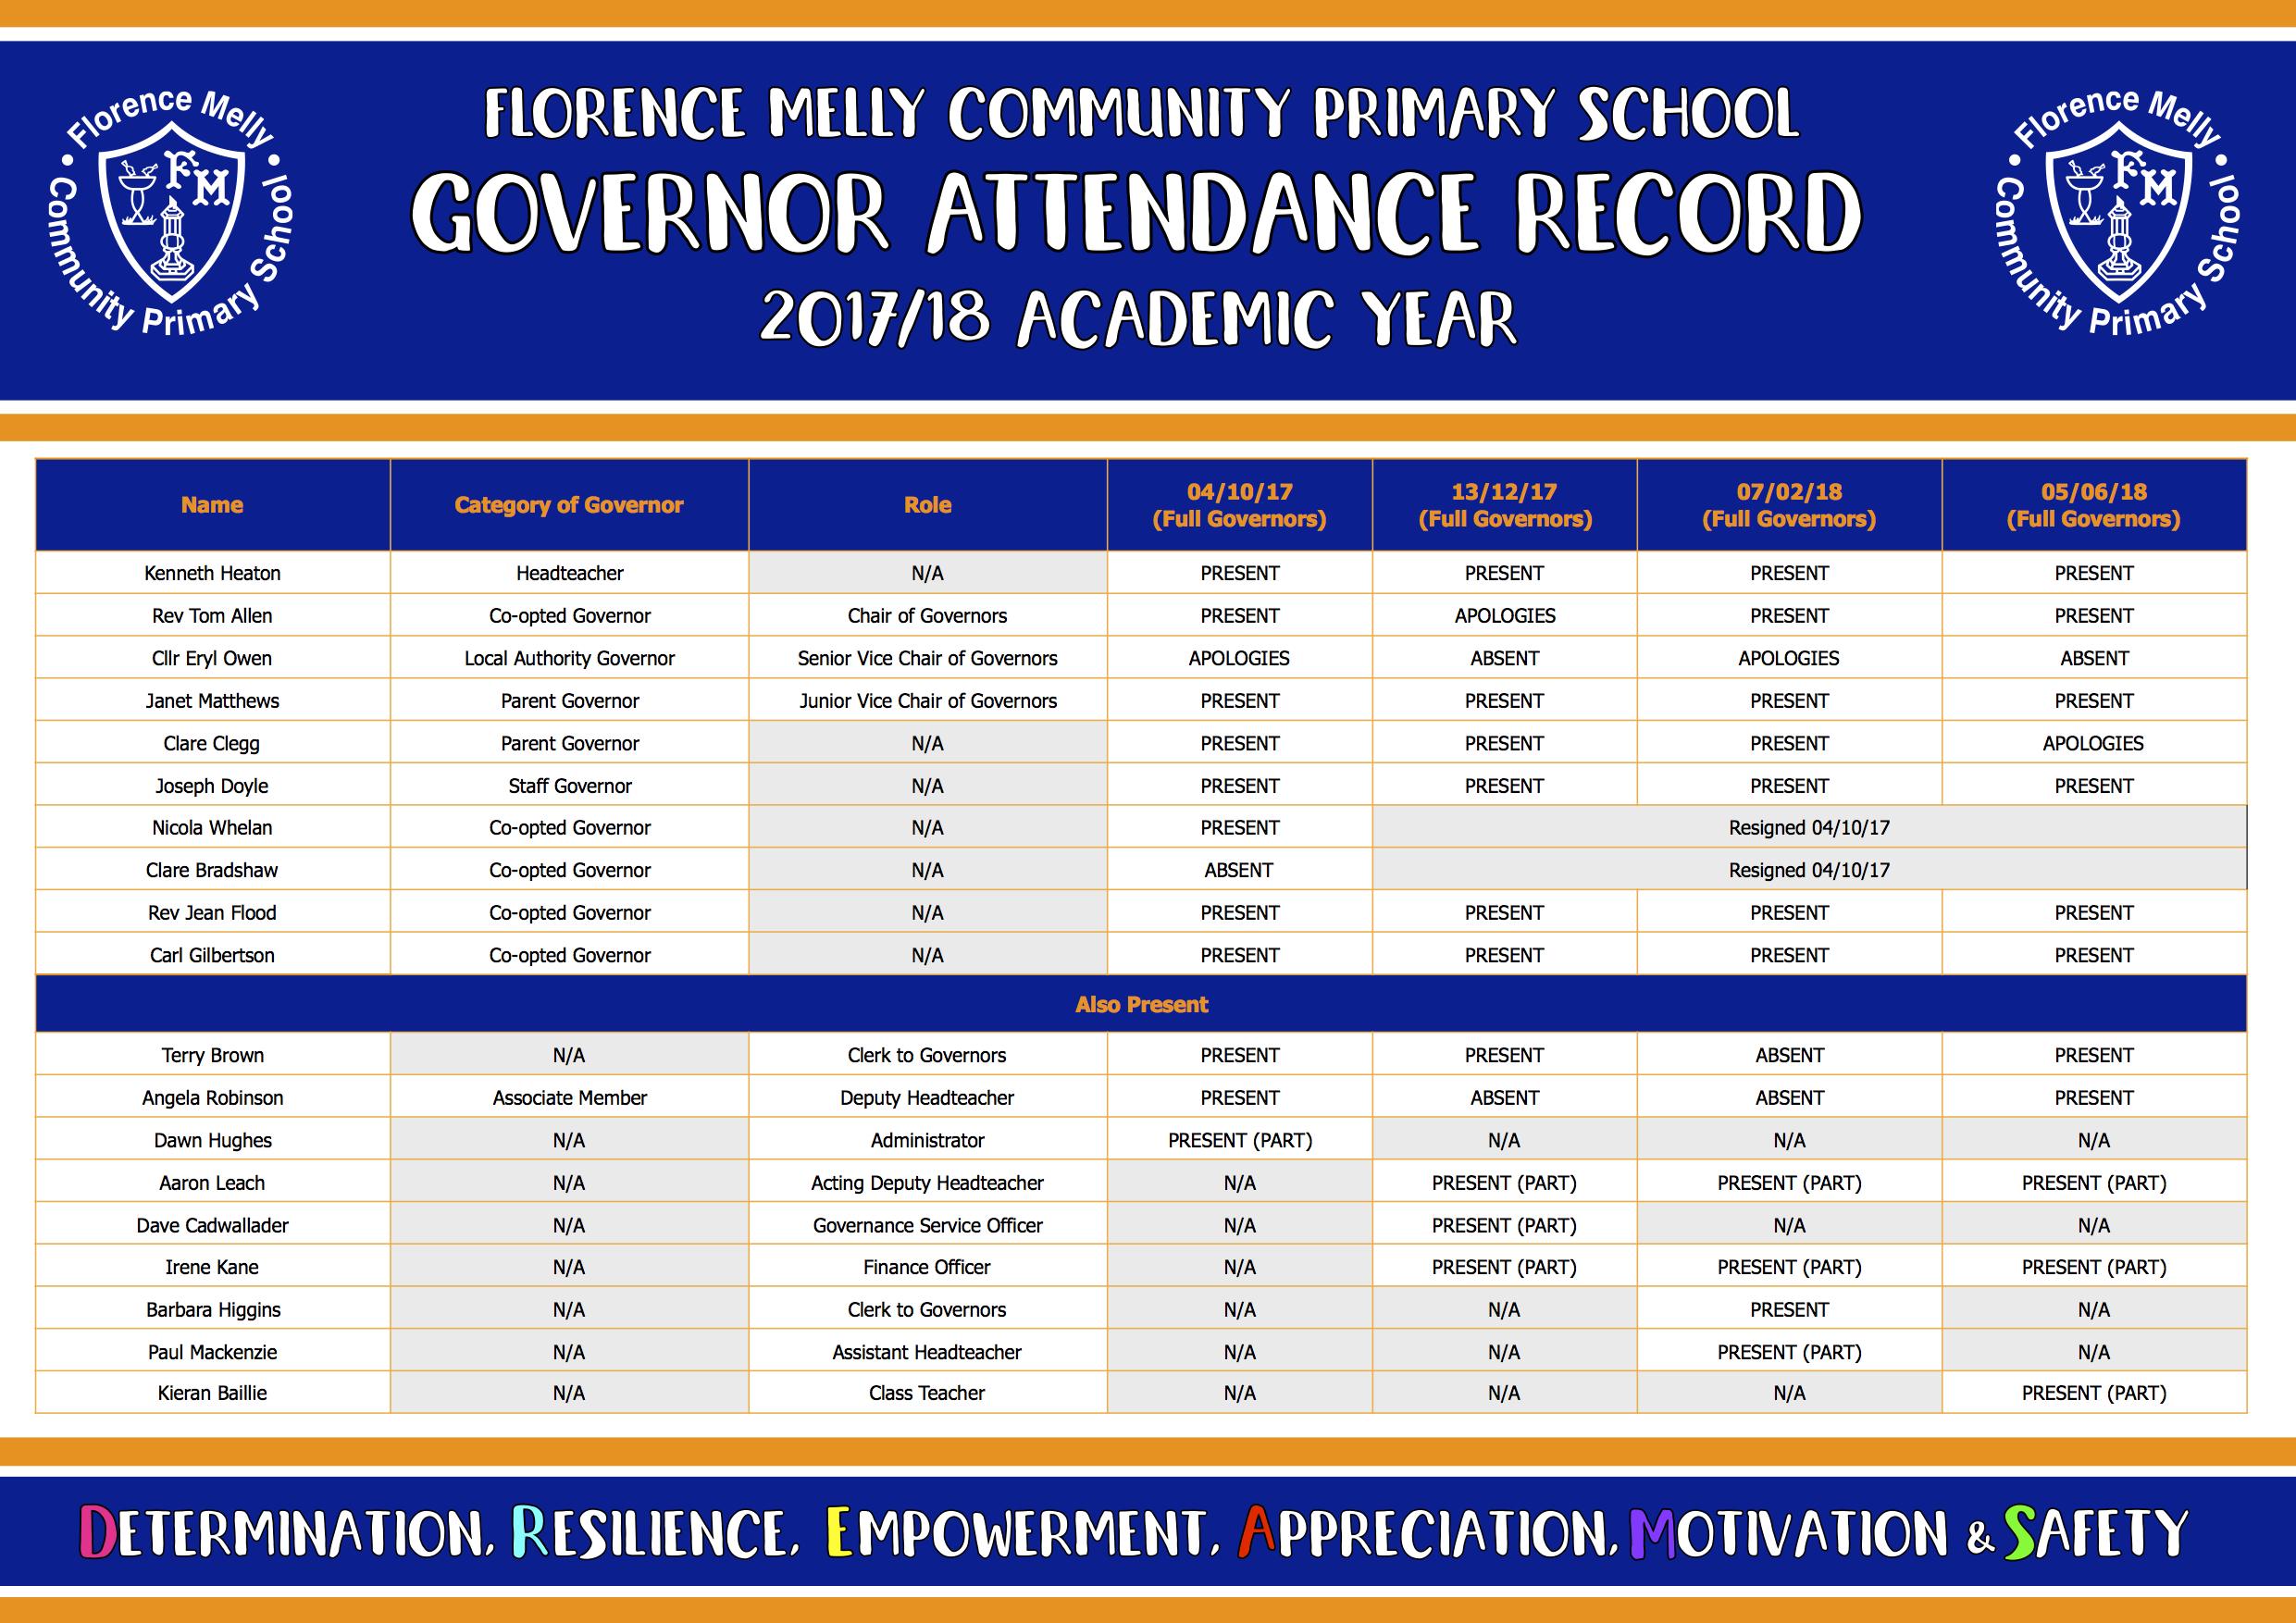 Governor Attendance Record 2017/18